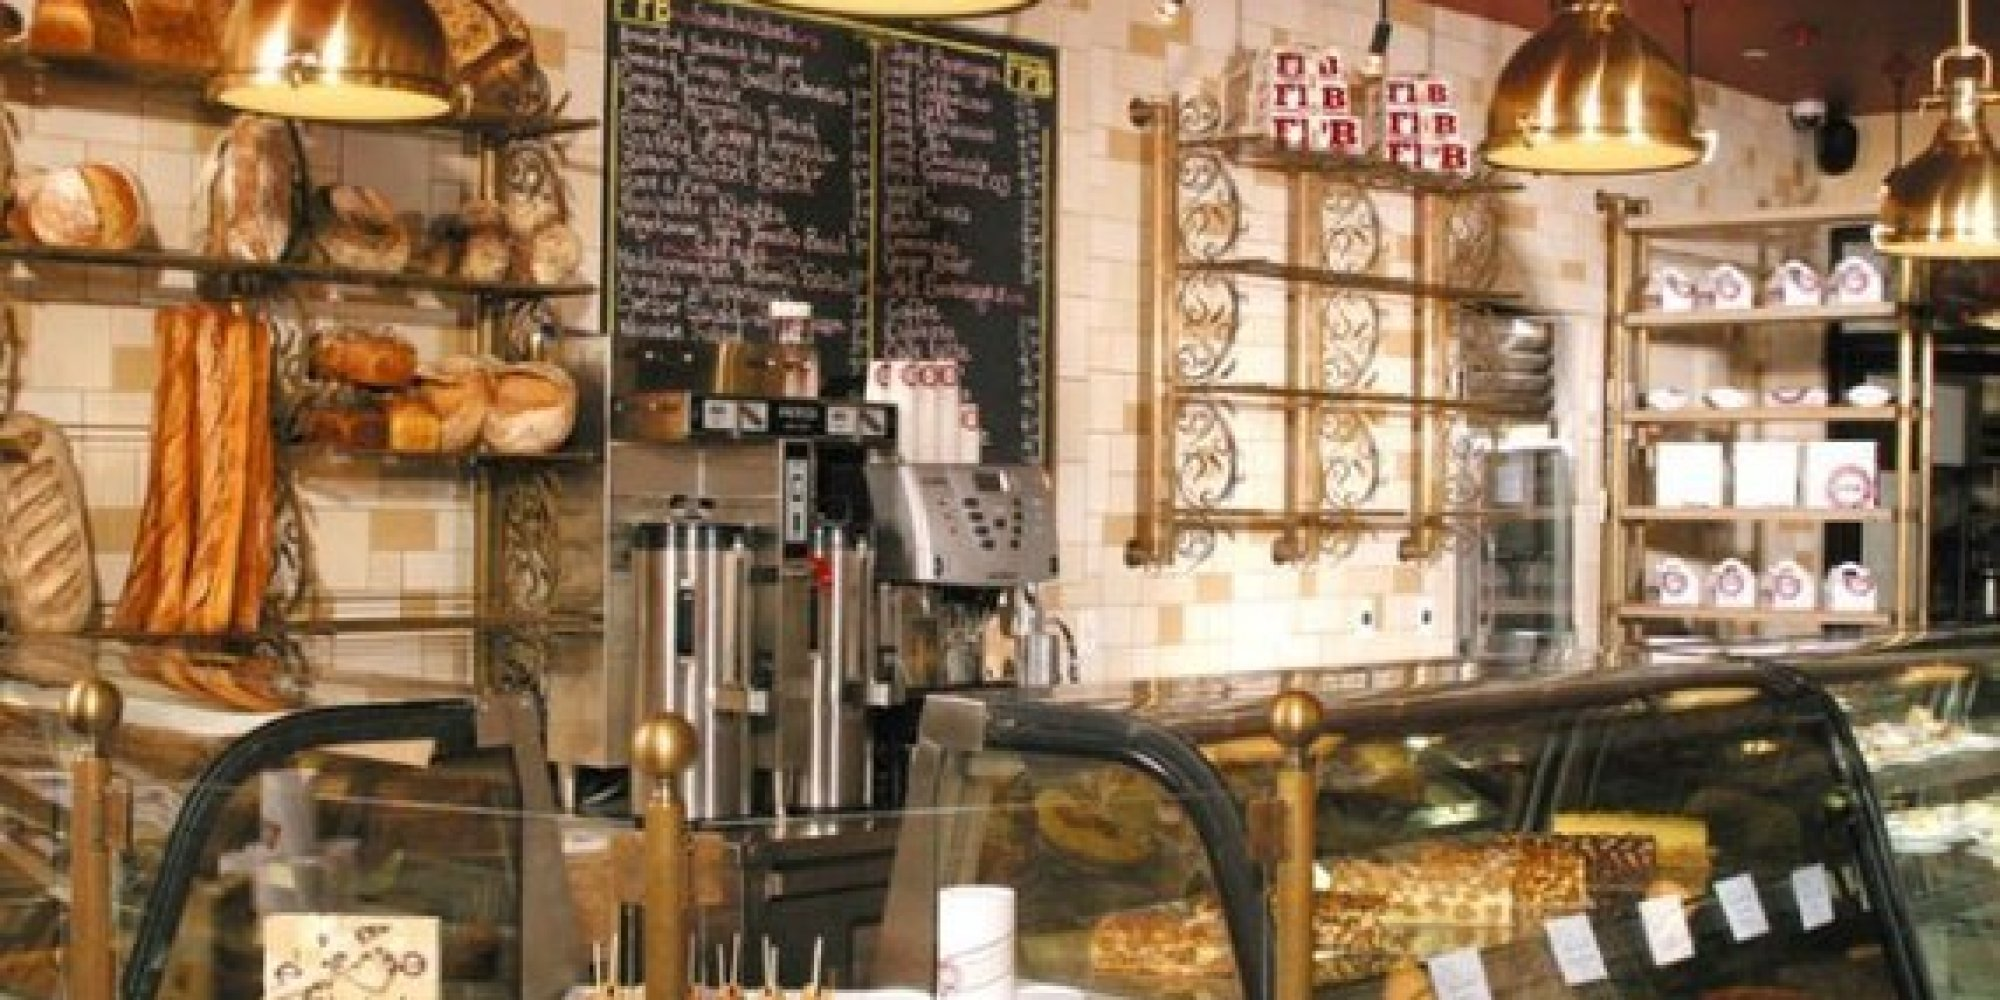 Boulangerie érotique new york city